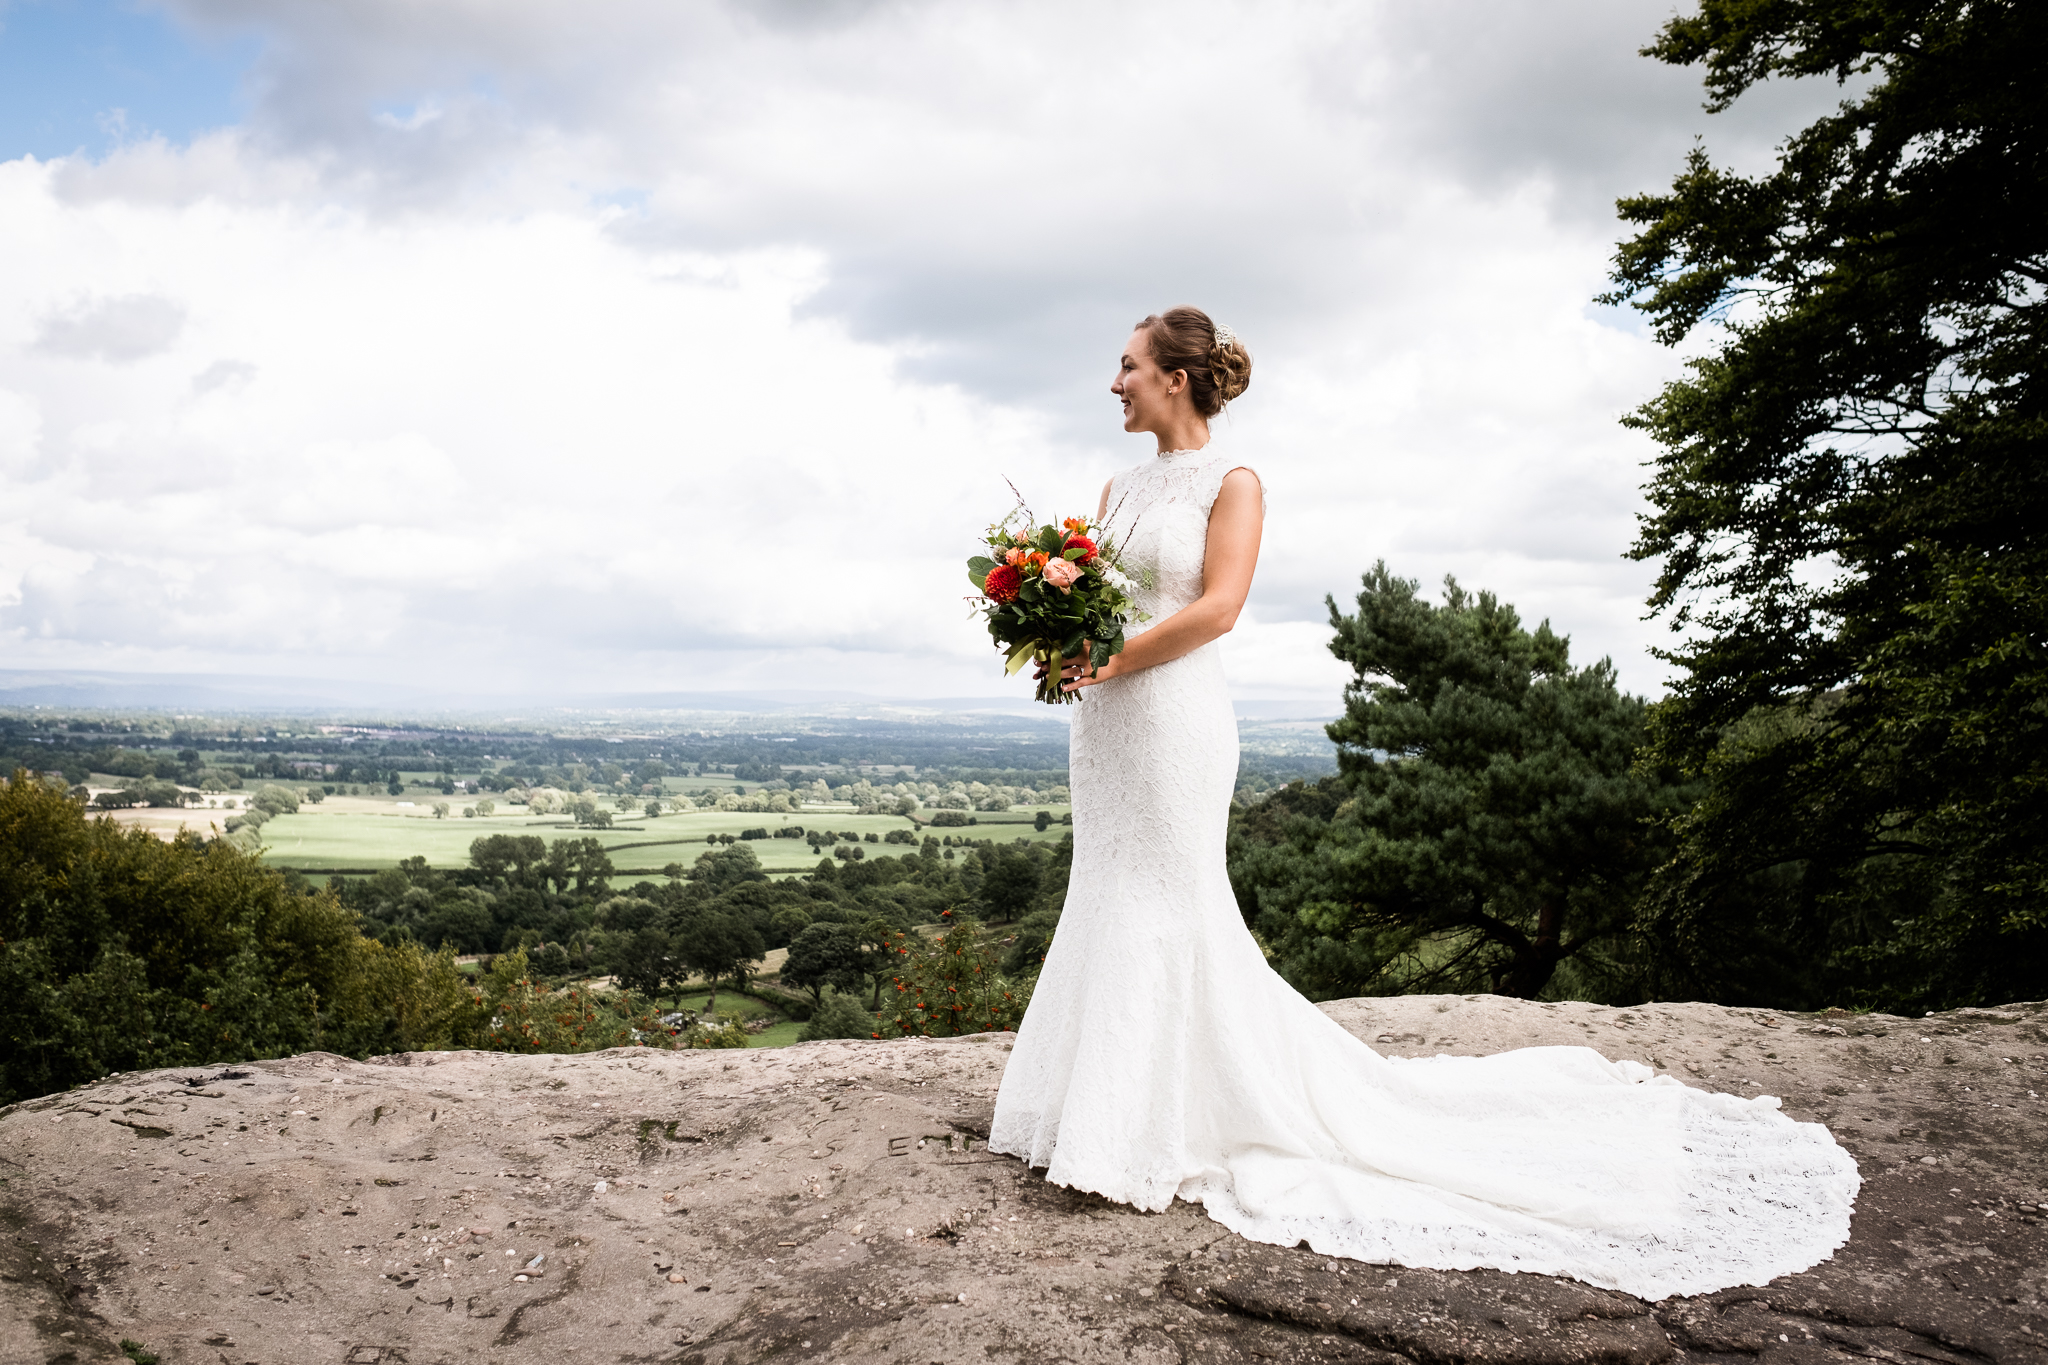 Relaxed Documentary Wedding Photography at The Wizard Inn, Alderley Edge Cheshire - Jenny Harper-44.jpg